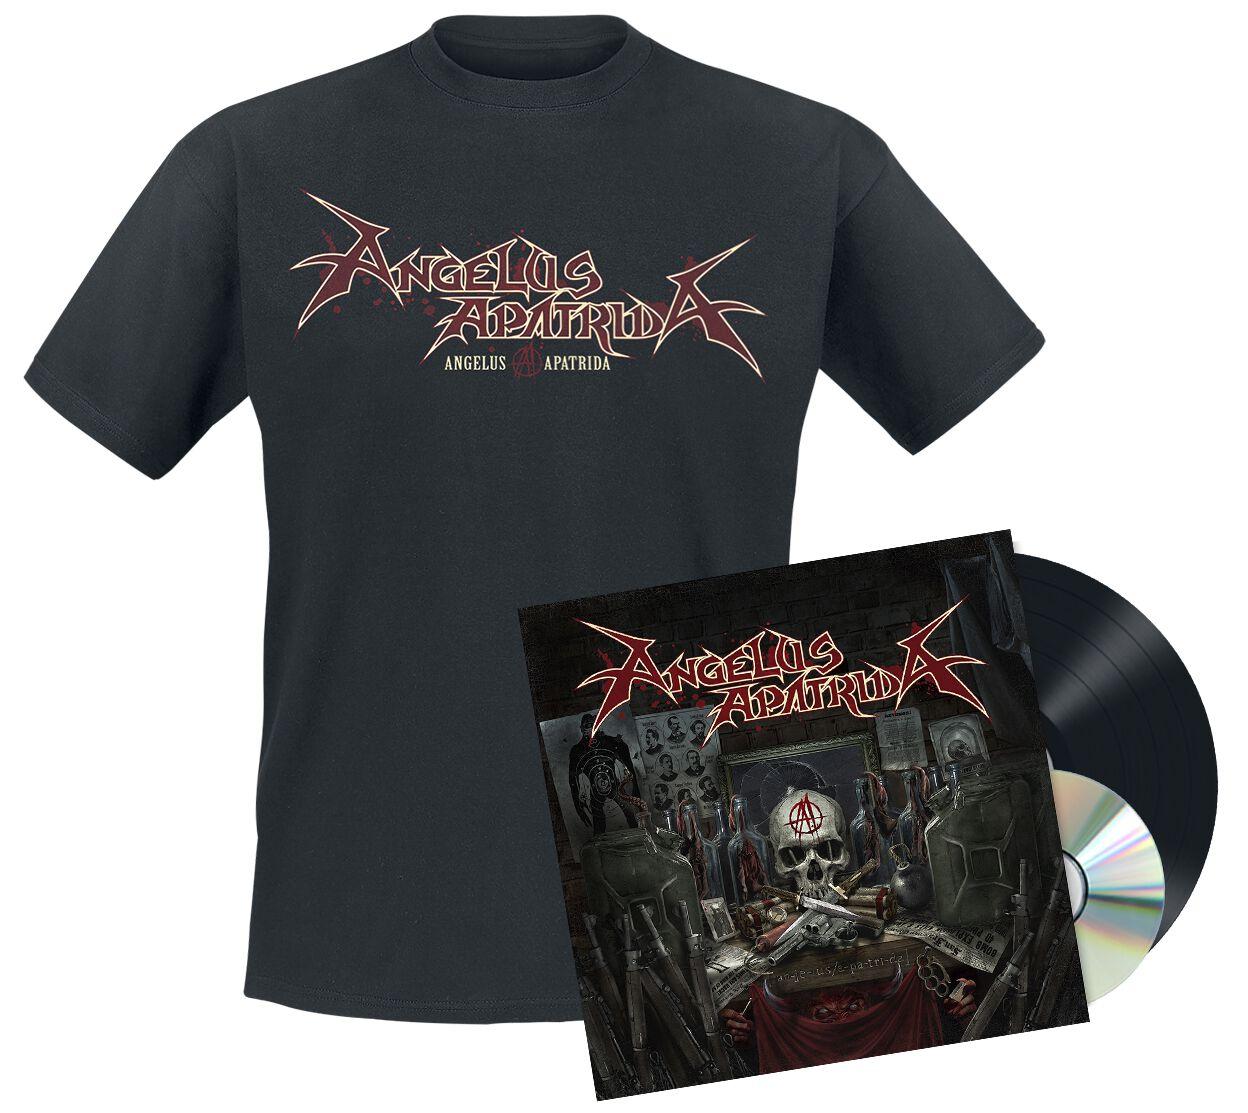 Image of Angelus Apatrida Angelus Apatrida LP & CD & T-Shirt Standard